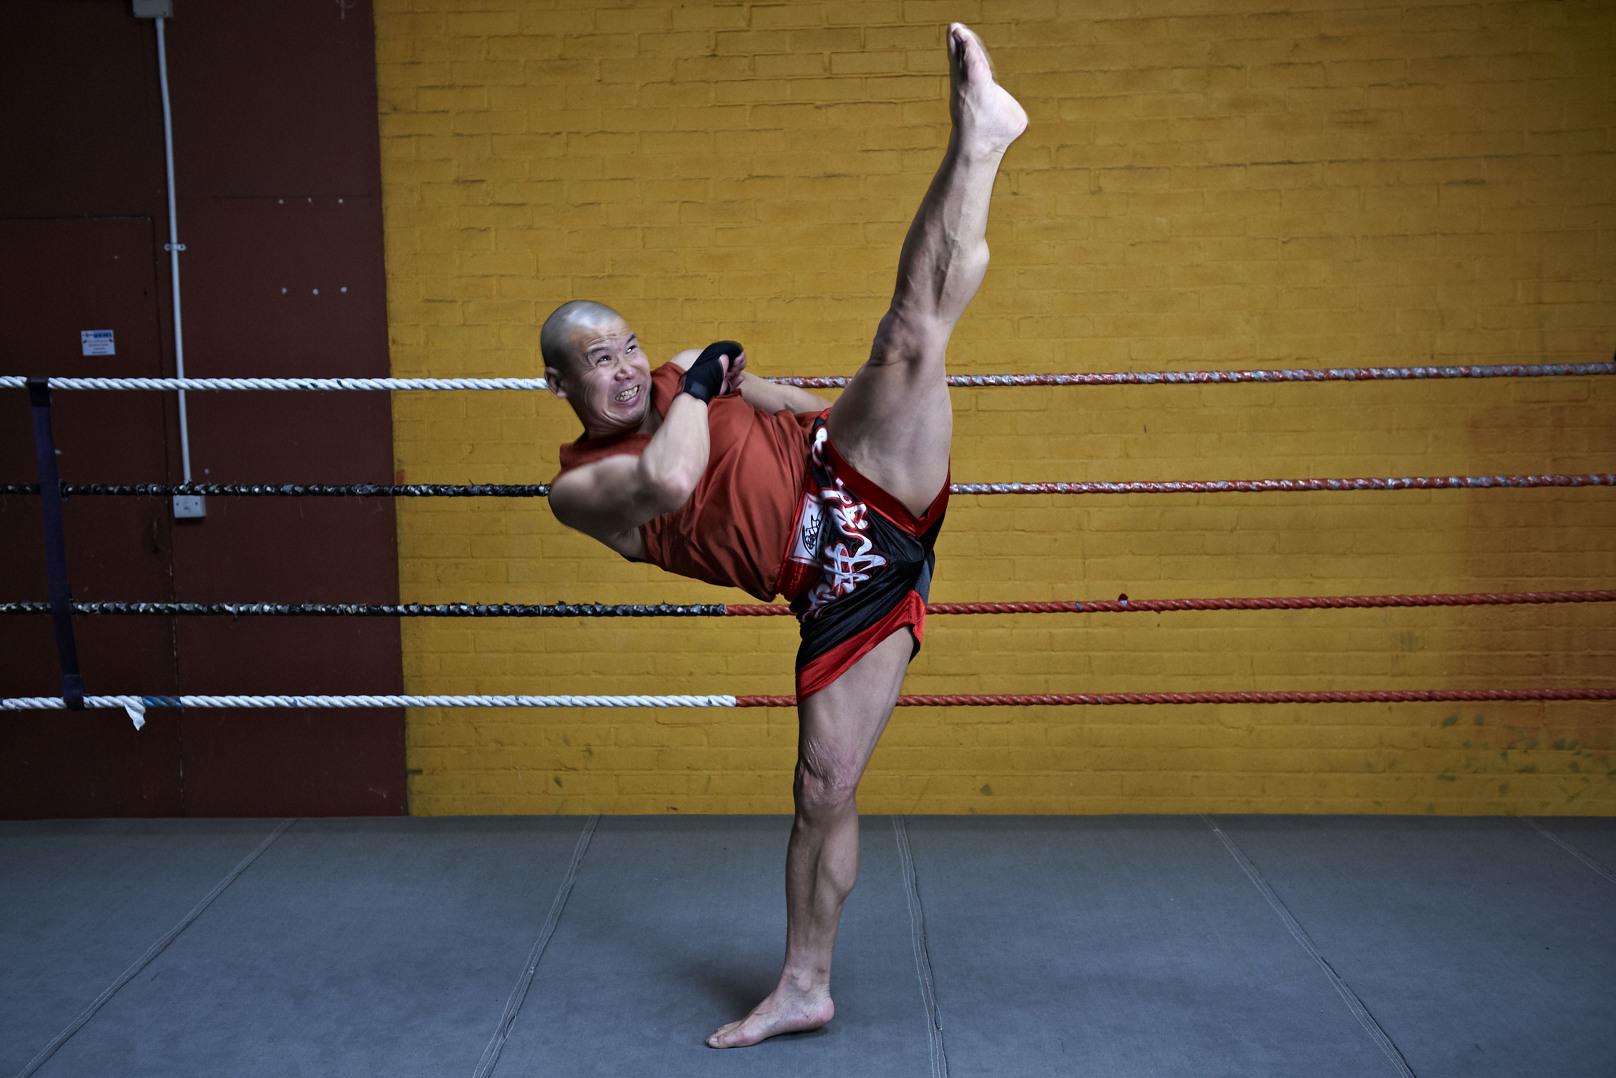 Shaolin temple uk shifu yanzi kick 26.jpg